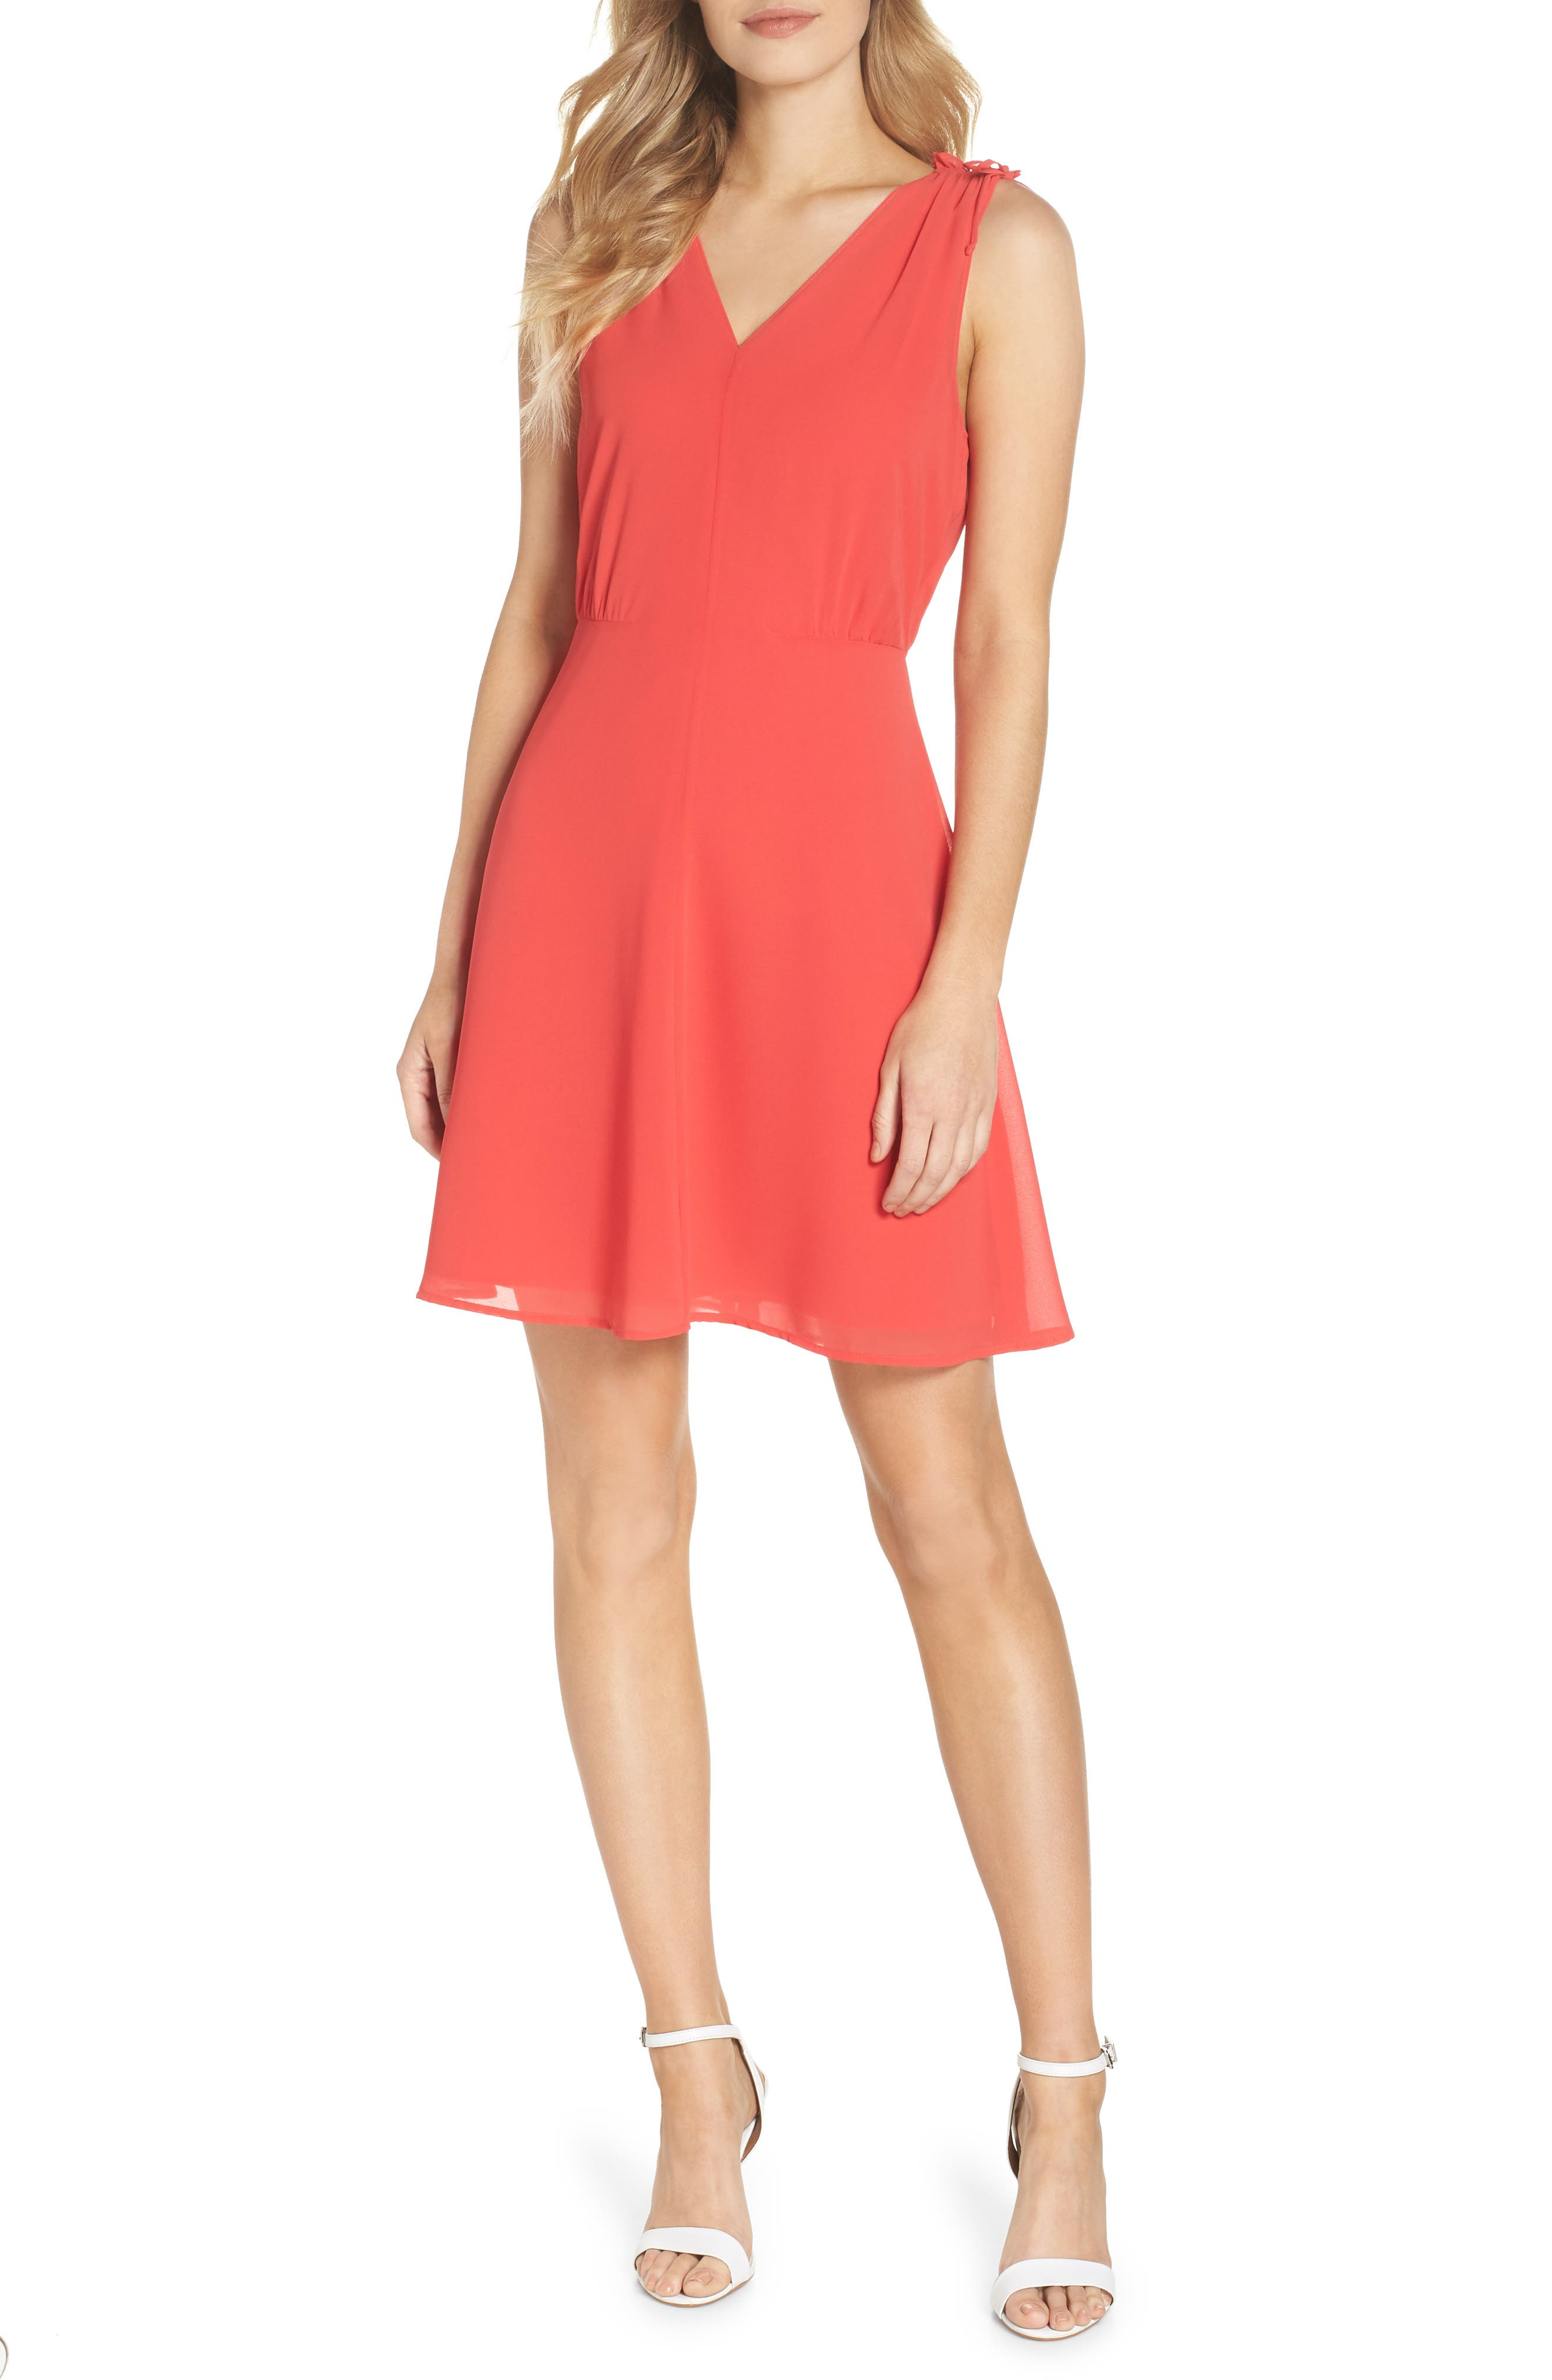 Soufflé V-Neck Chiffon Dress,                             Main thumbnail 1, color,                             Strawberry